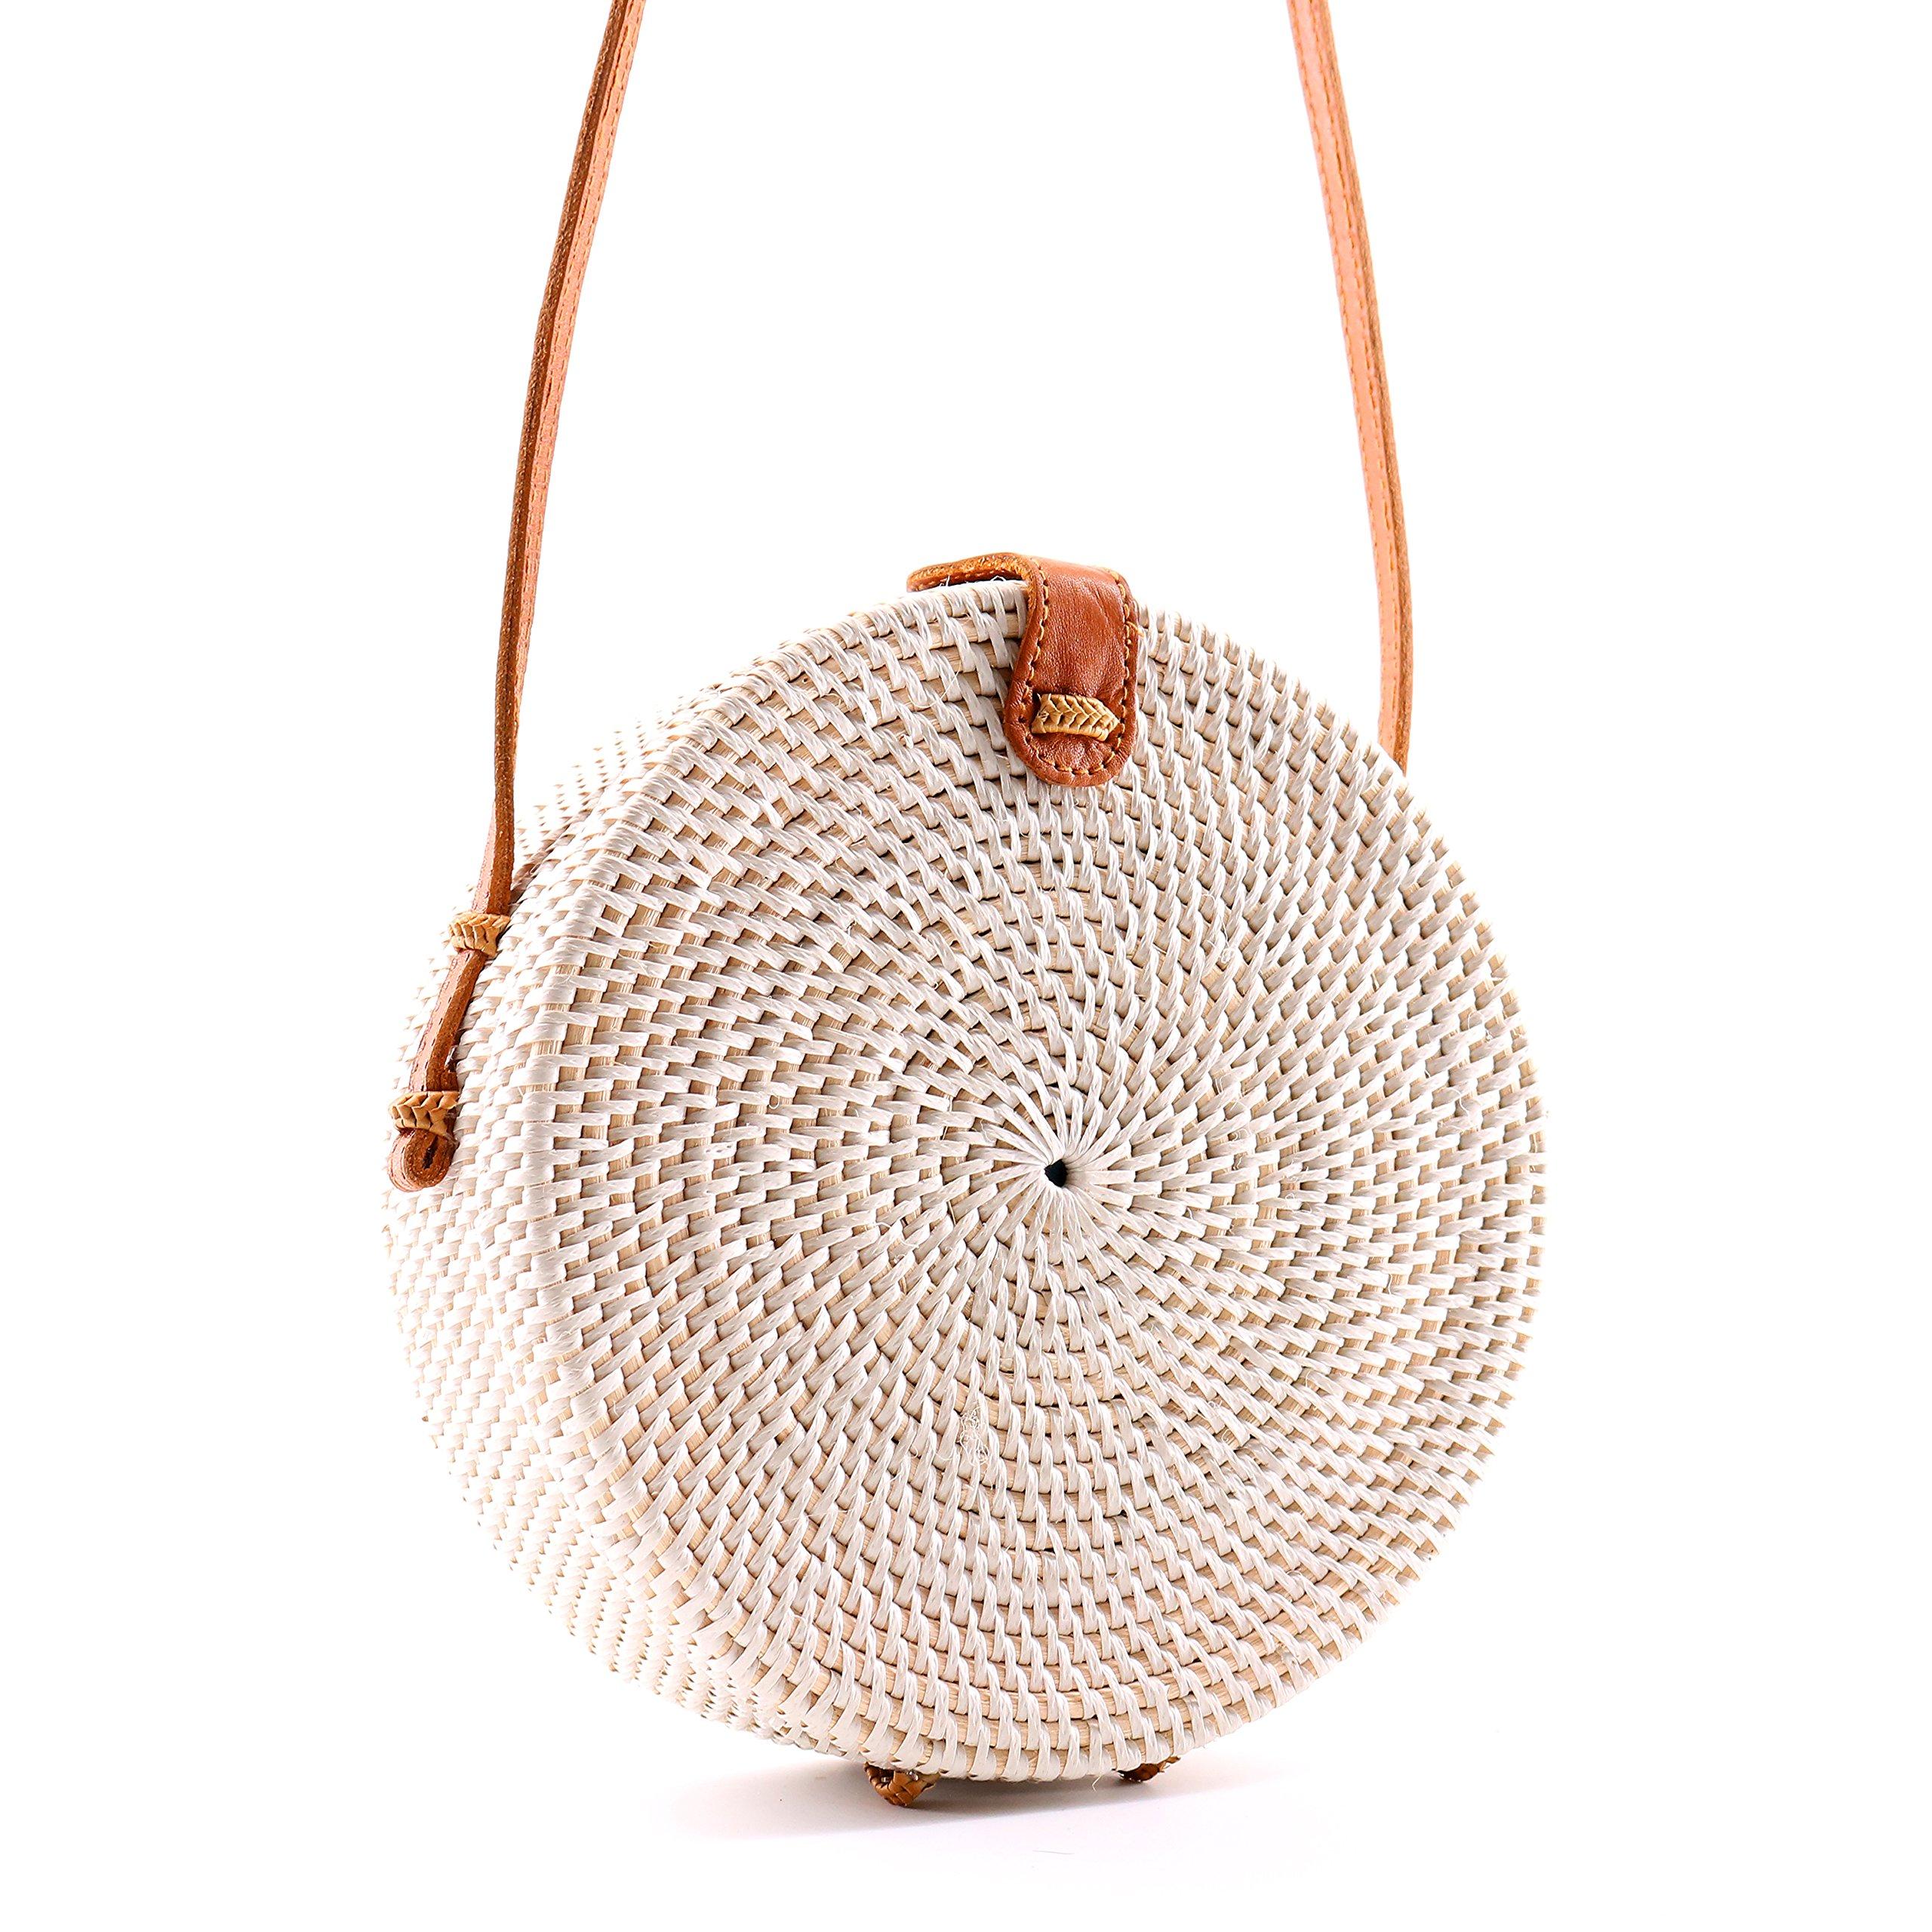 Seven Island Women Vintage Handmade Bali Round Straw Rattan Shoulder Leather Strap Button Snap Crossbody Messenger Satchel Beach Handbag Bag (White, 20cm)